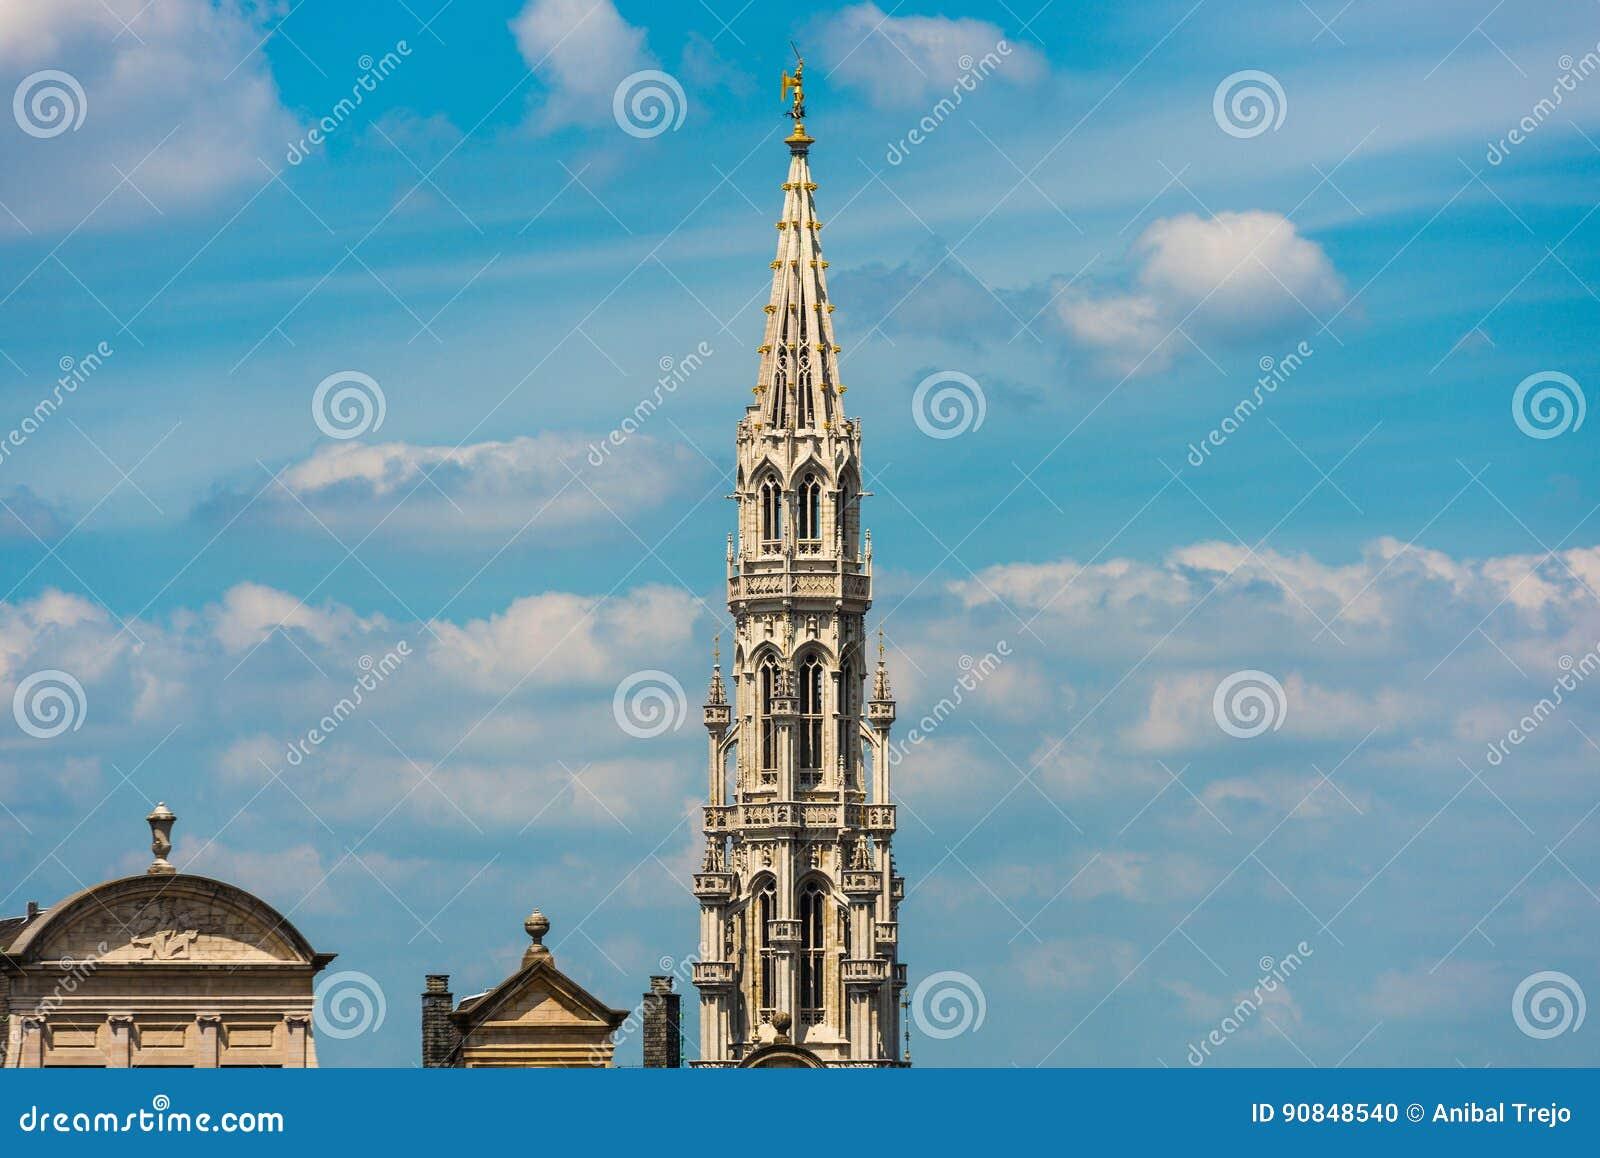 Góra sztuki w Bruksela, Belgia